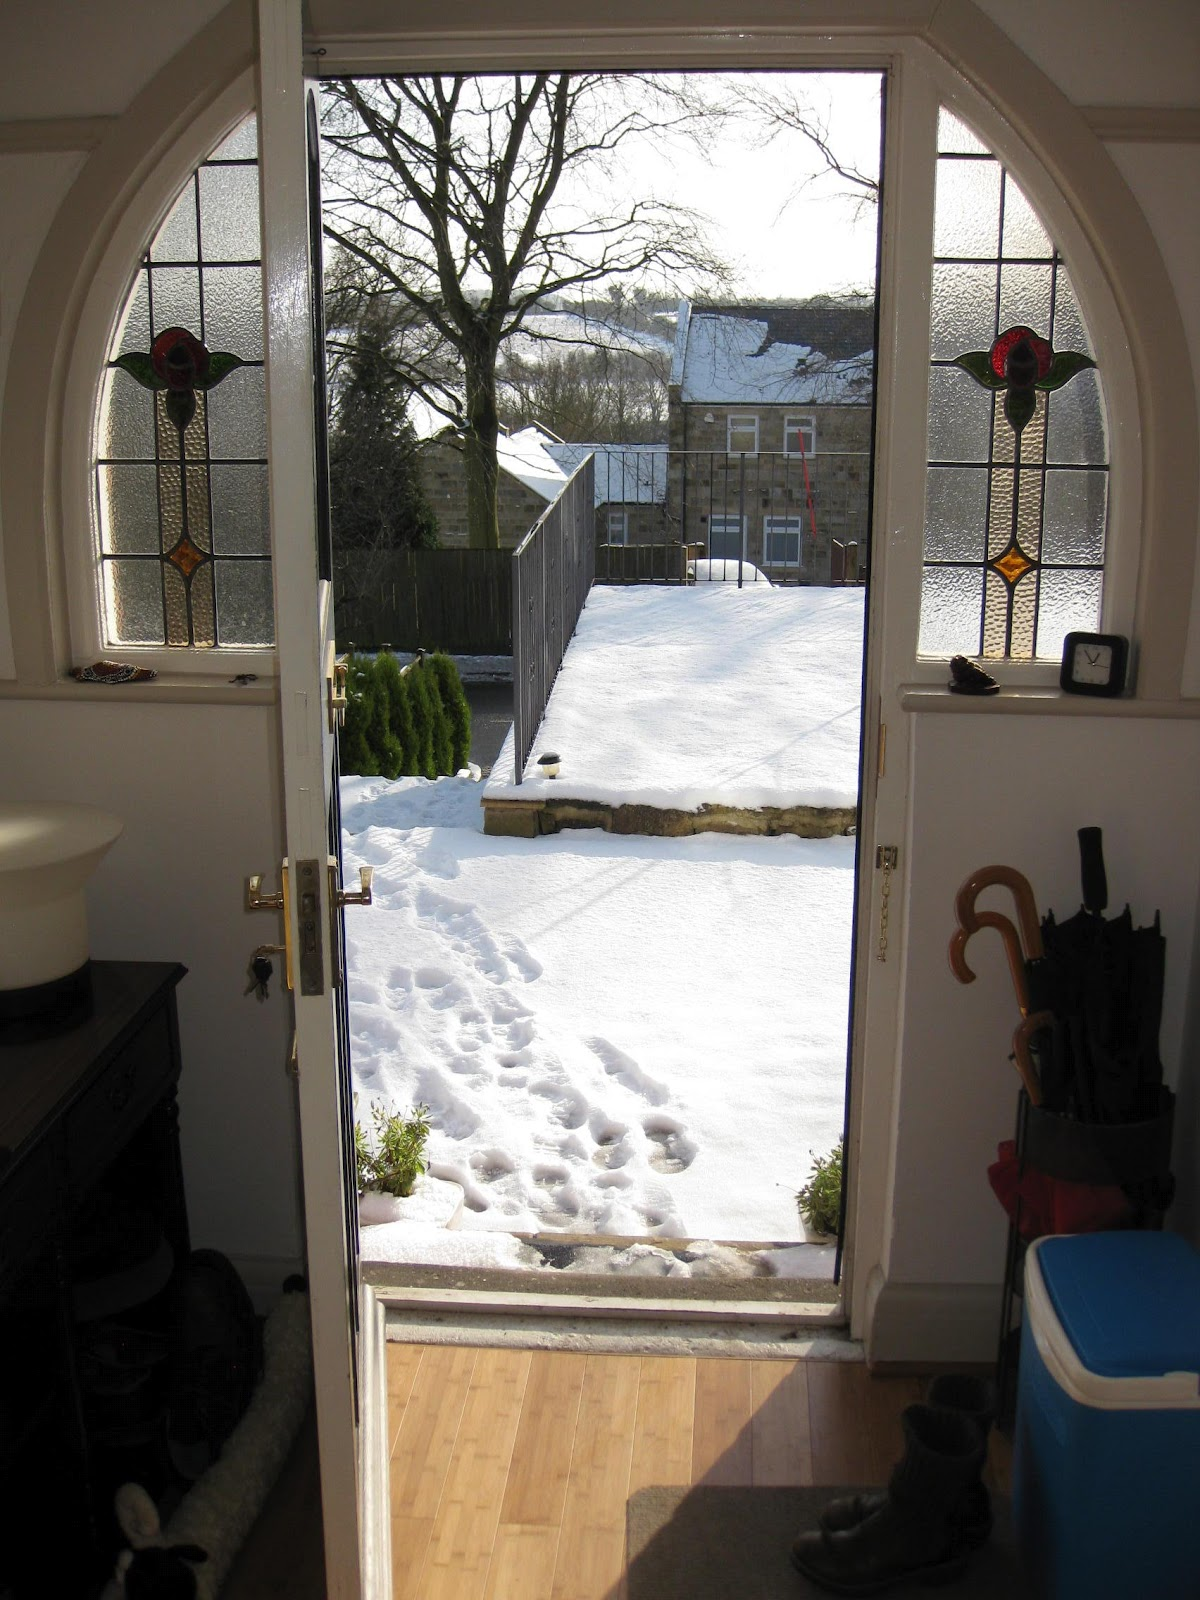 http://3.bp.blogspot.com/-ocVIU6E6ujQ/TzFuvhGDexI/AAAAAAAADWE/V5PPA_Ved4A/s1600/12+02+snow+tower+003.jpg